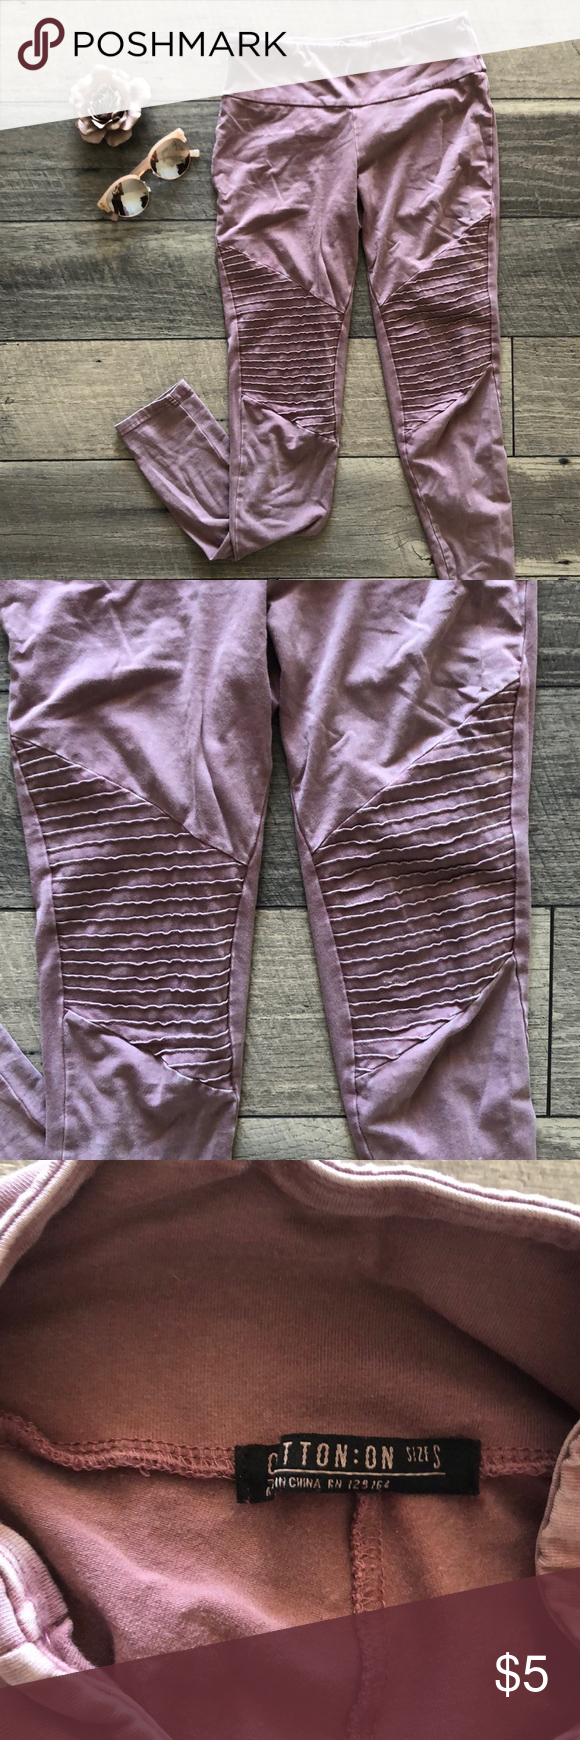 Cotton On Blush Dakota Leggings Leggings Are Not Pants Clothes Design Pink Leggings